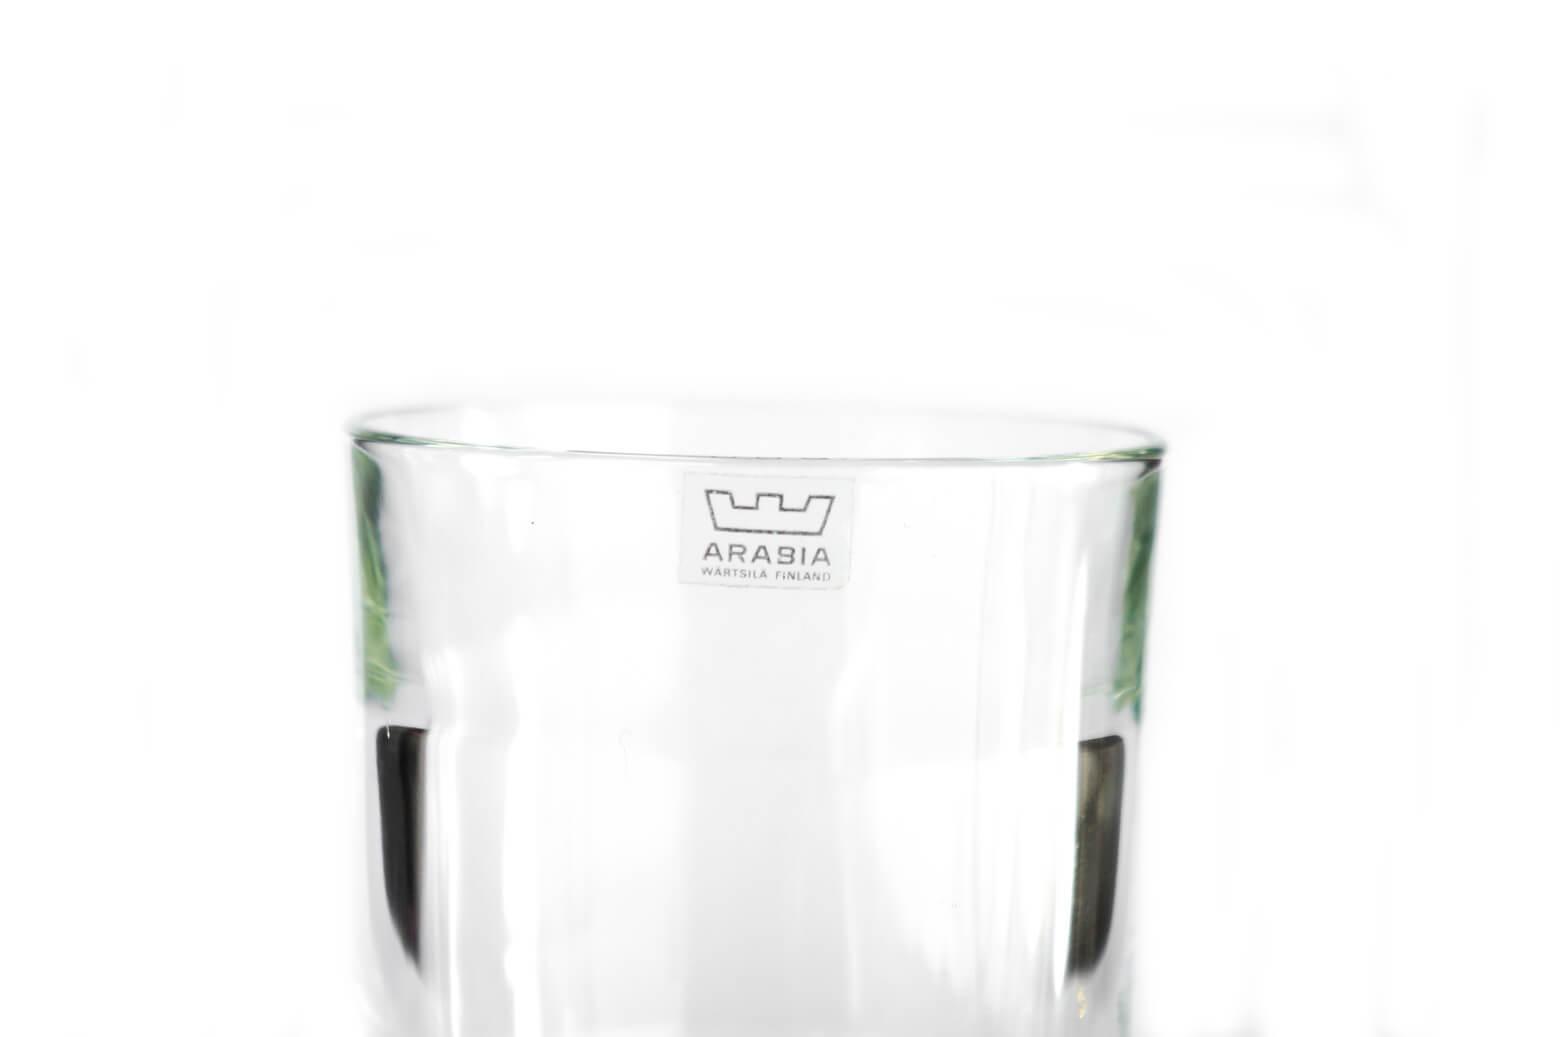 ARABIA Tumbler PRISMA Kaj Franck/アラビア タンブラー プリズマ カイ・フランク グラス ヴィンテージ 北欧食器 1